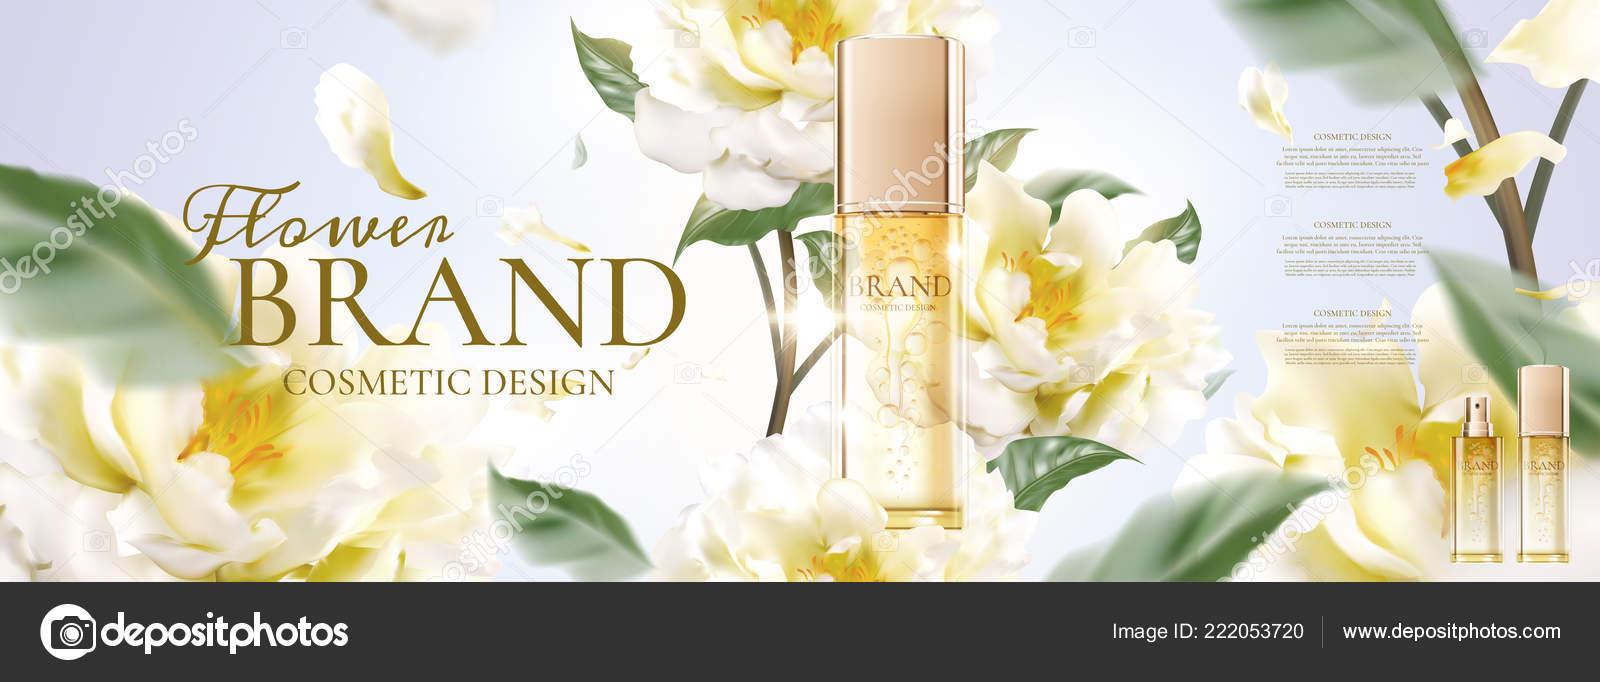 Floral Skincare Banner Ads Petals Flying Product Illustration Stock Vector C Kchungtw 222053720